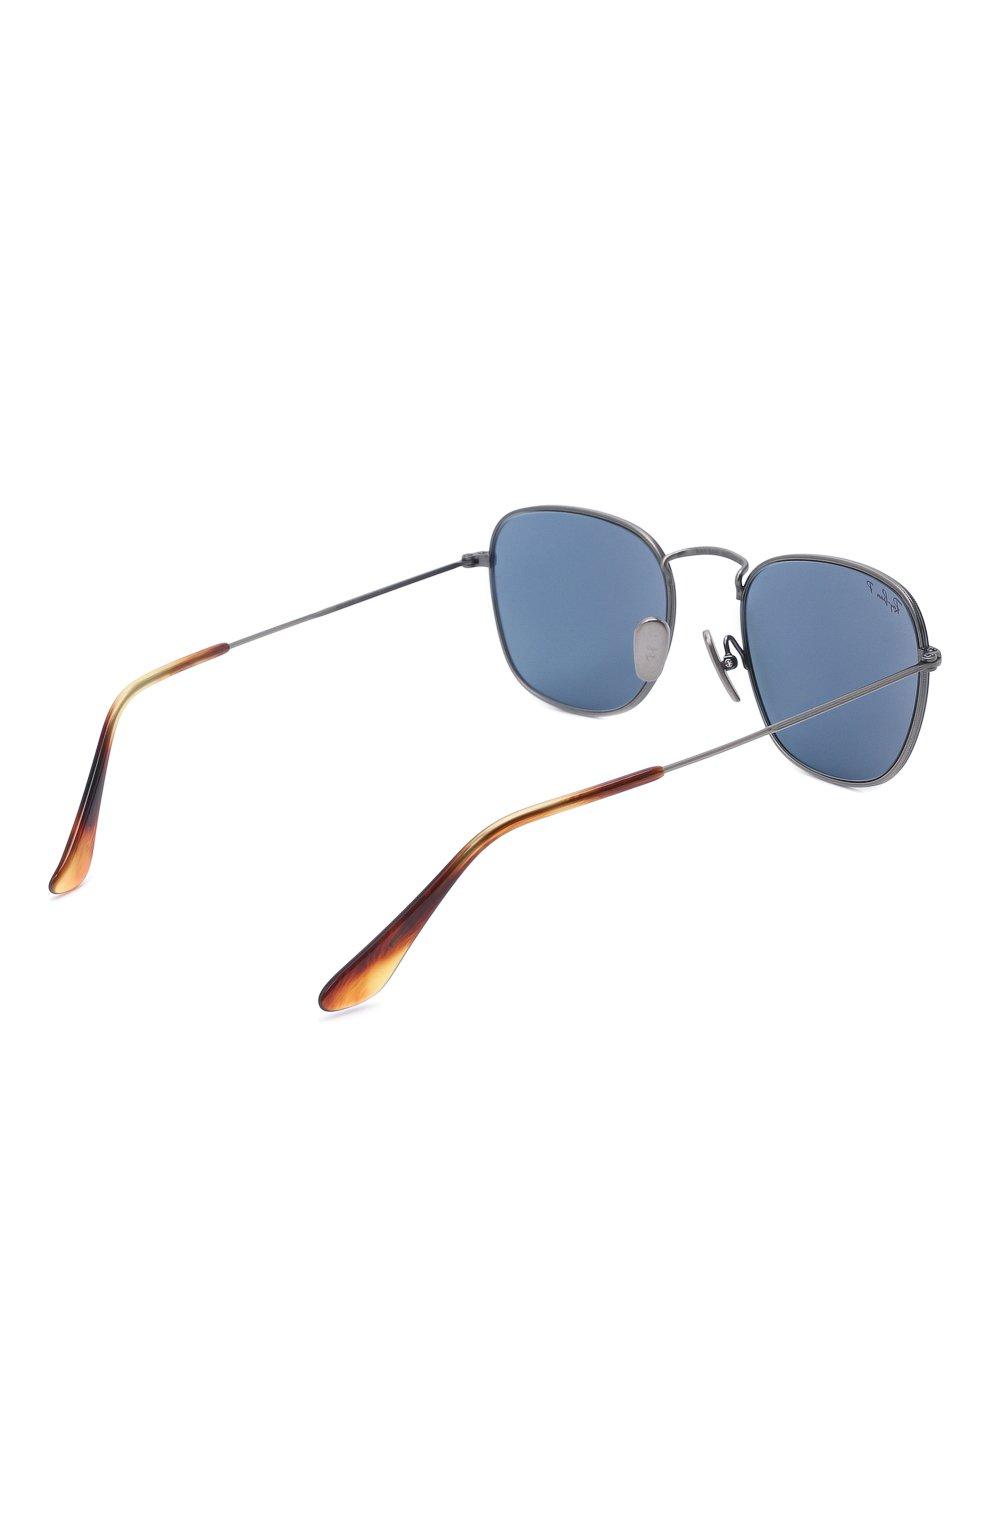 Женские солнцезащитные очки RAY-BAN темно-синего цвета, арт. 8157-9208T0 | Фото 5